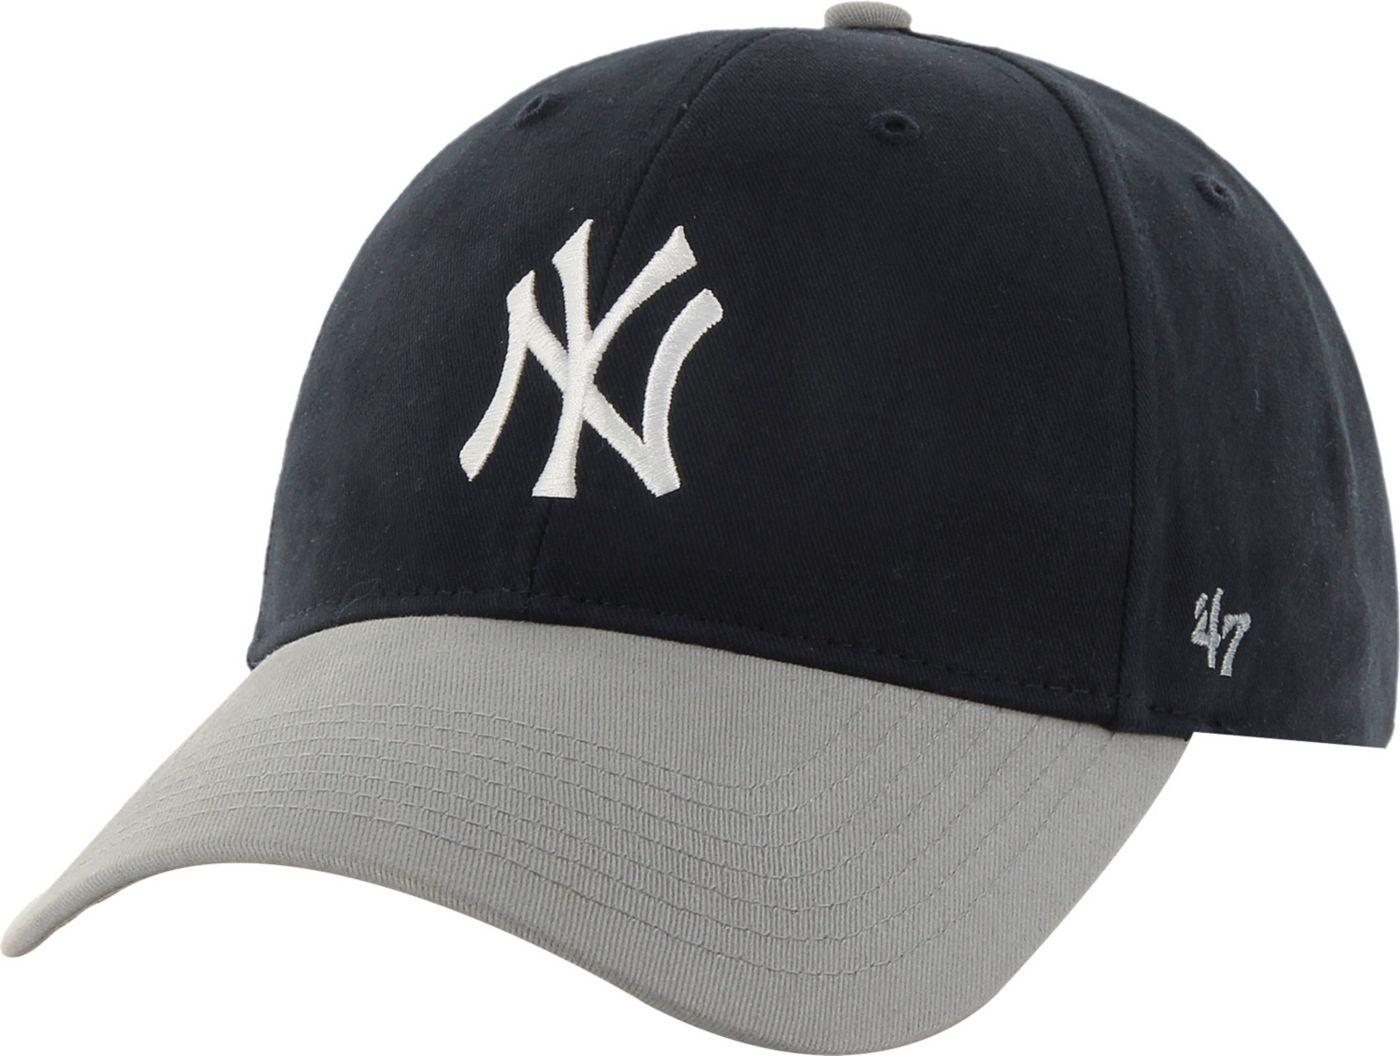 '47 Youth New York Yankees Short Stack MVP Navy/Grey Adjustable Hat